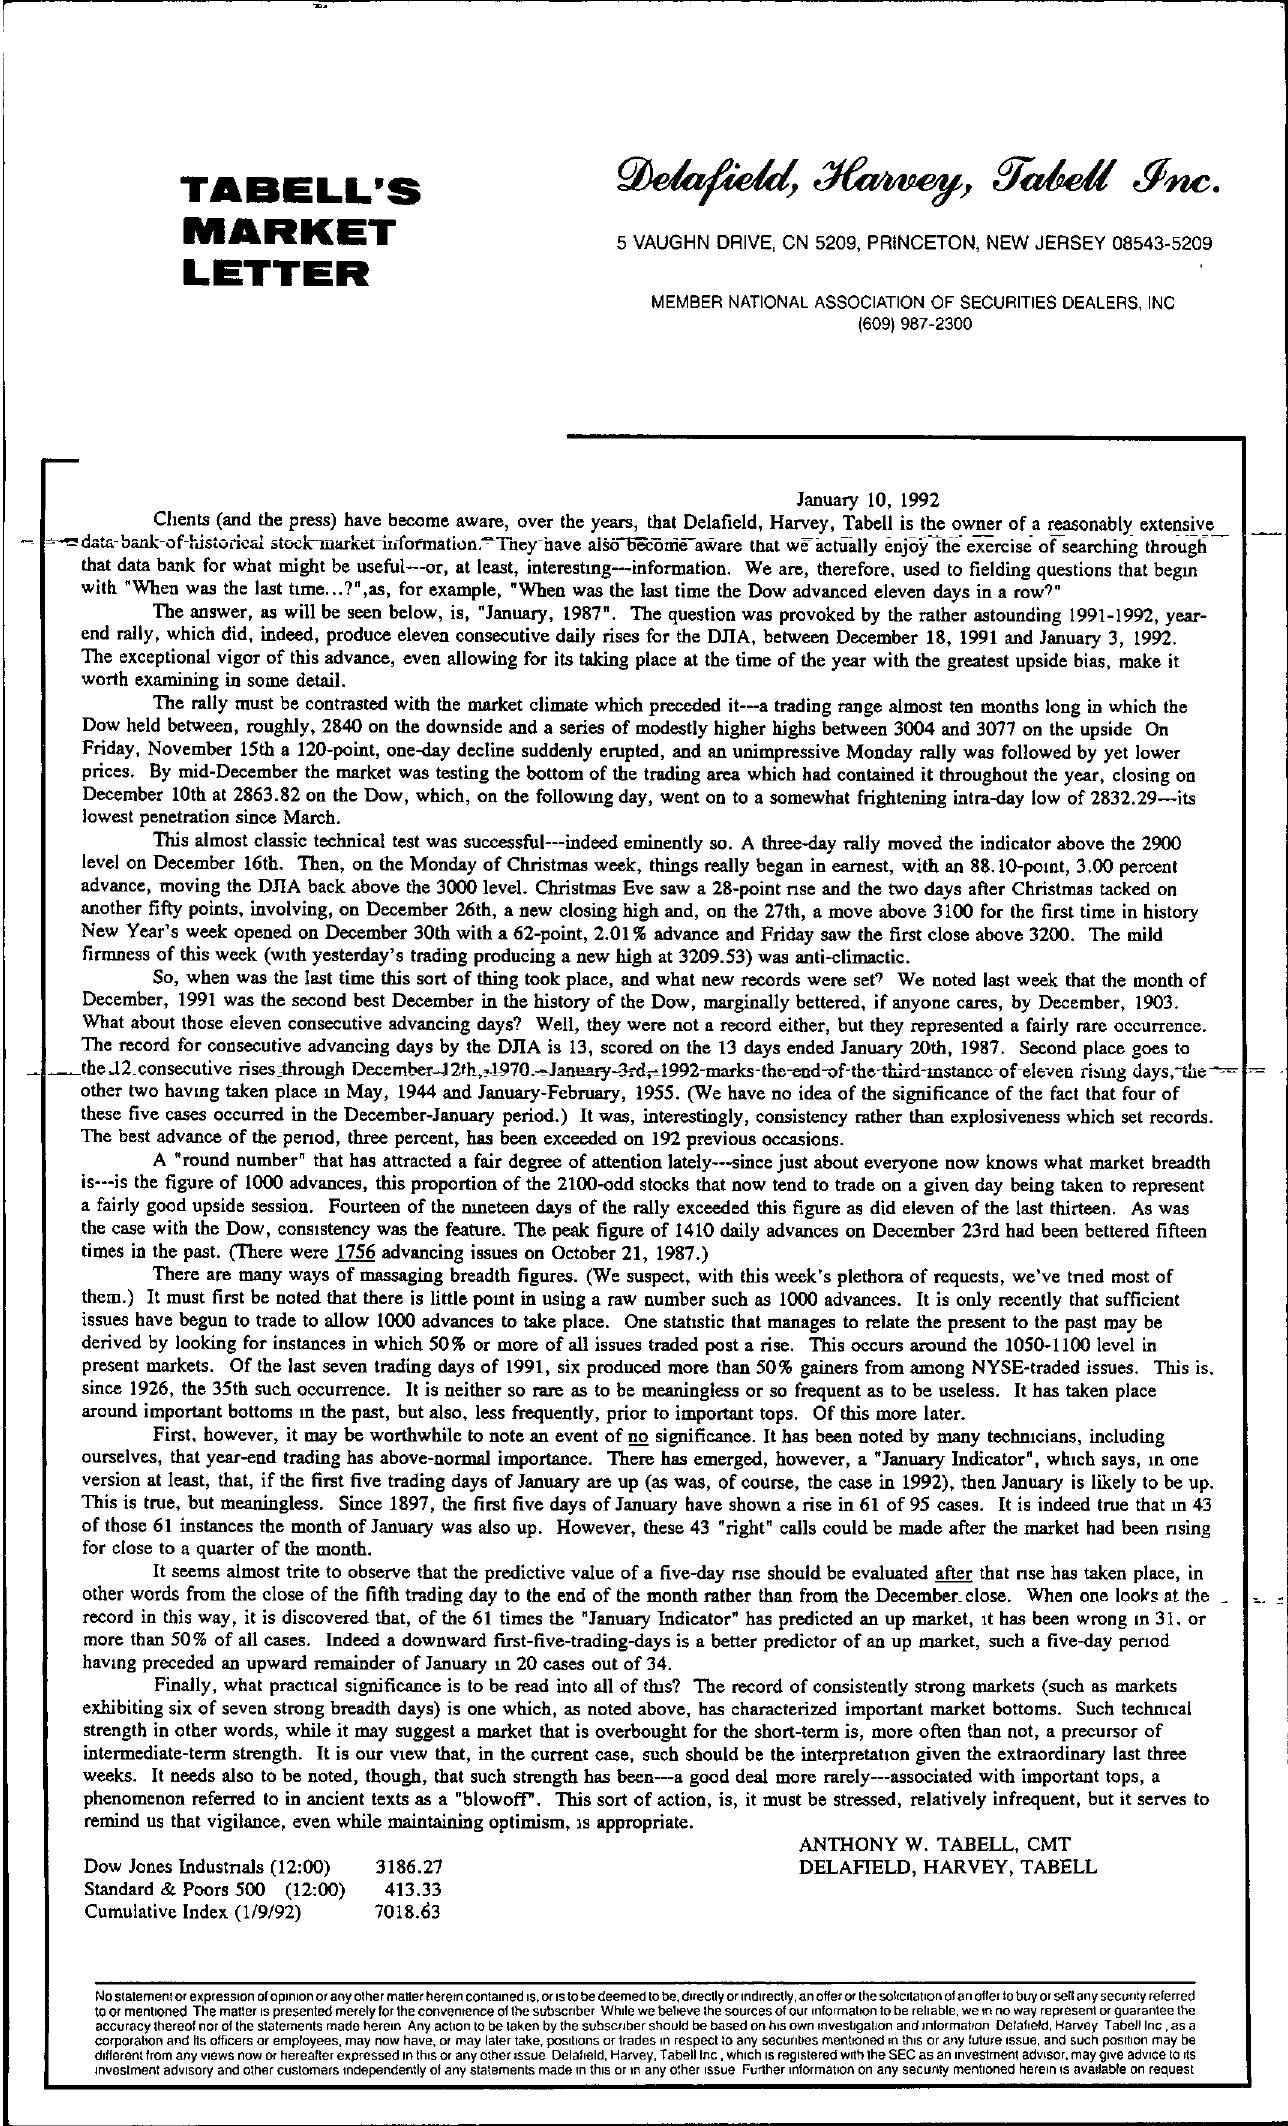 Tabell's Market Letter - January 10, 1992